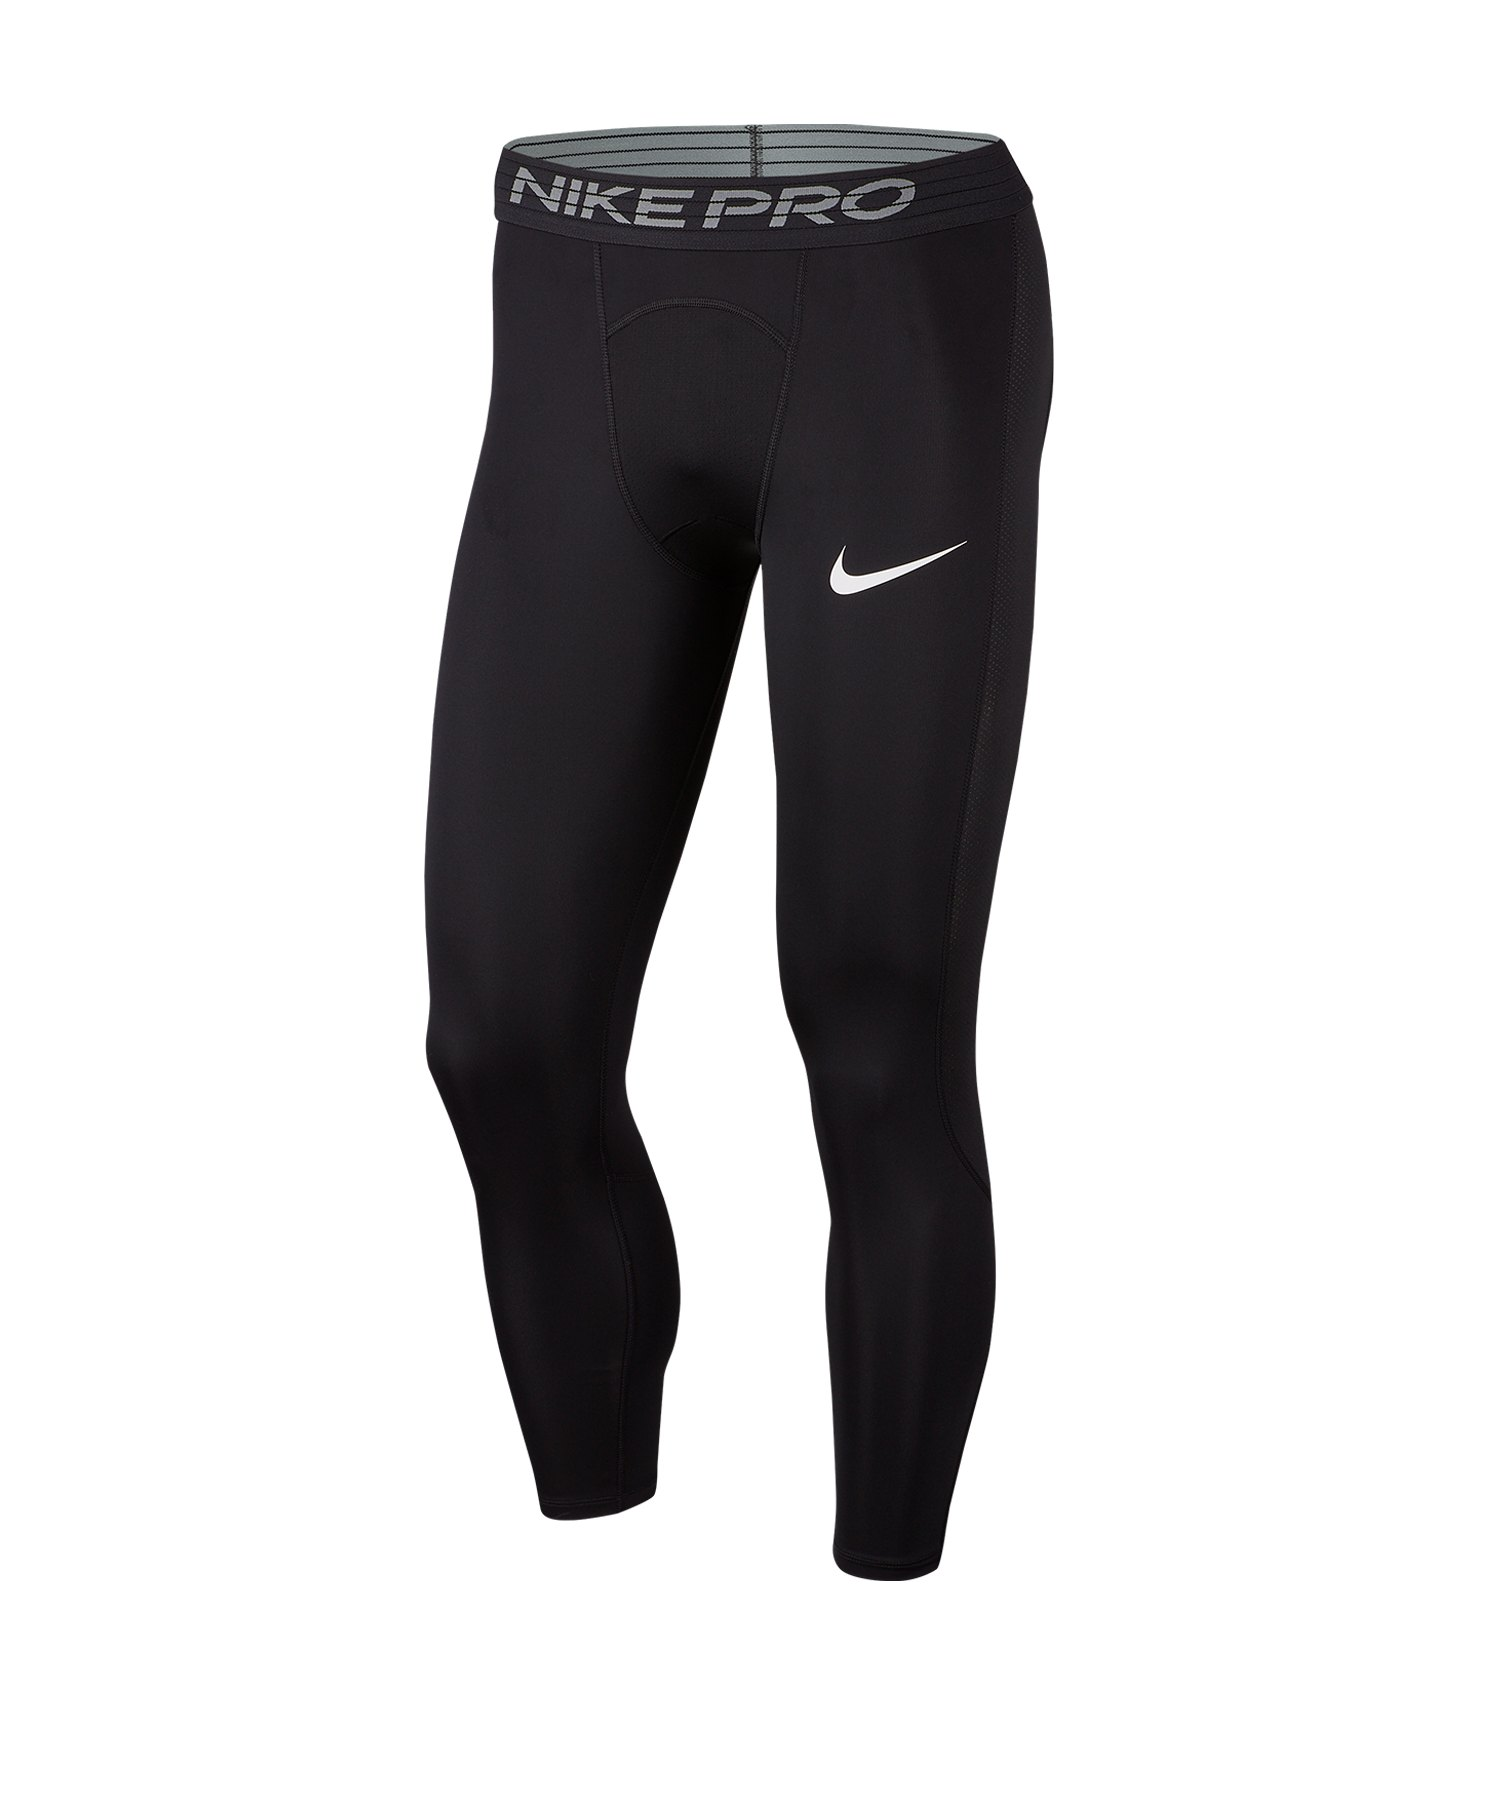 Nike Pro 3/4 Training Tight Schwarz F010 - schwarz